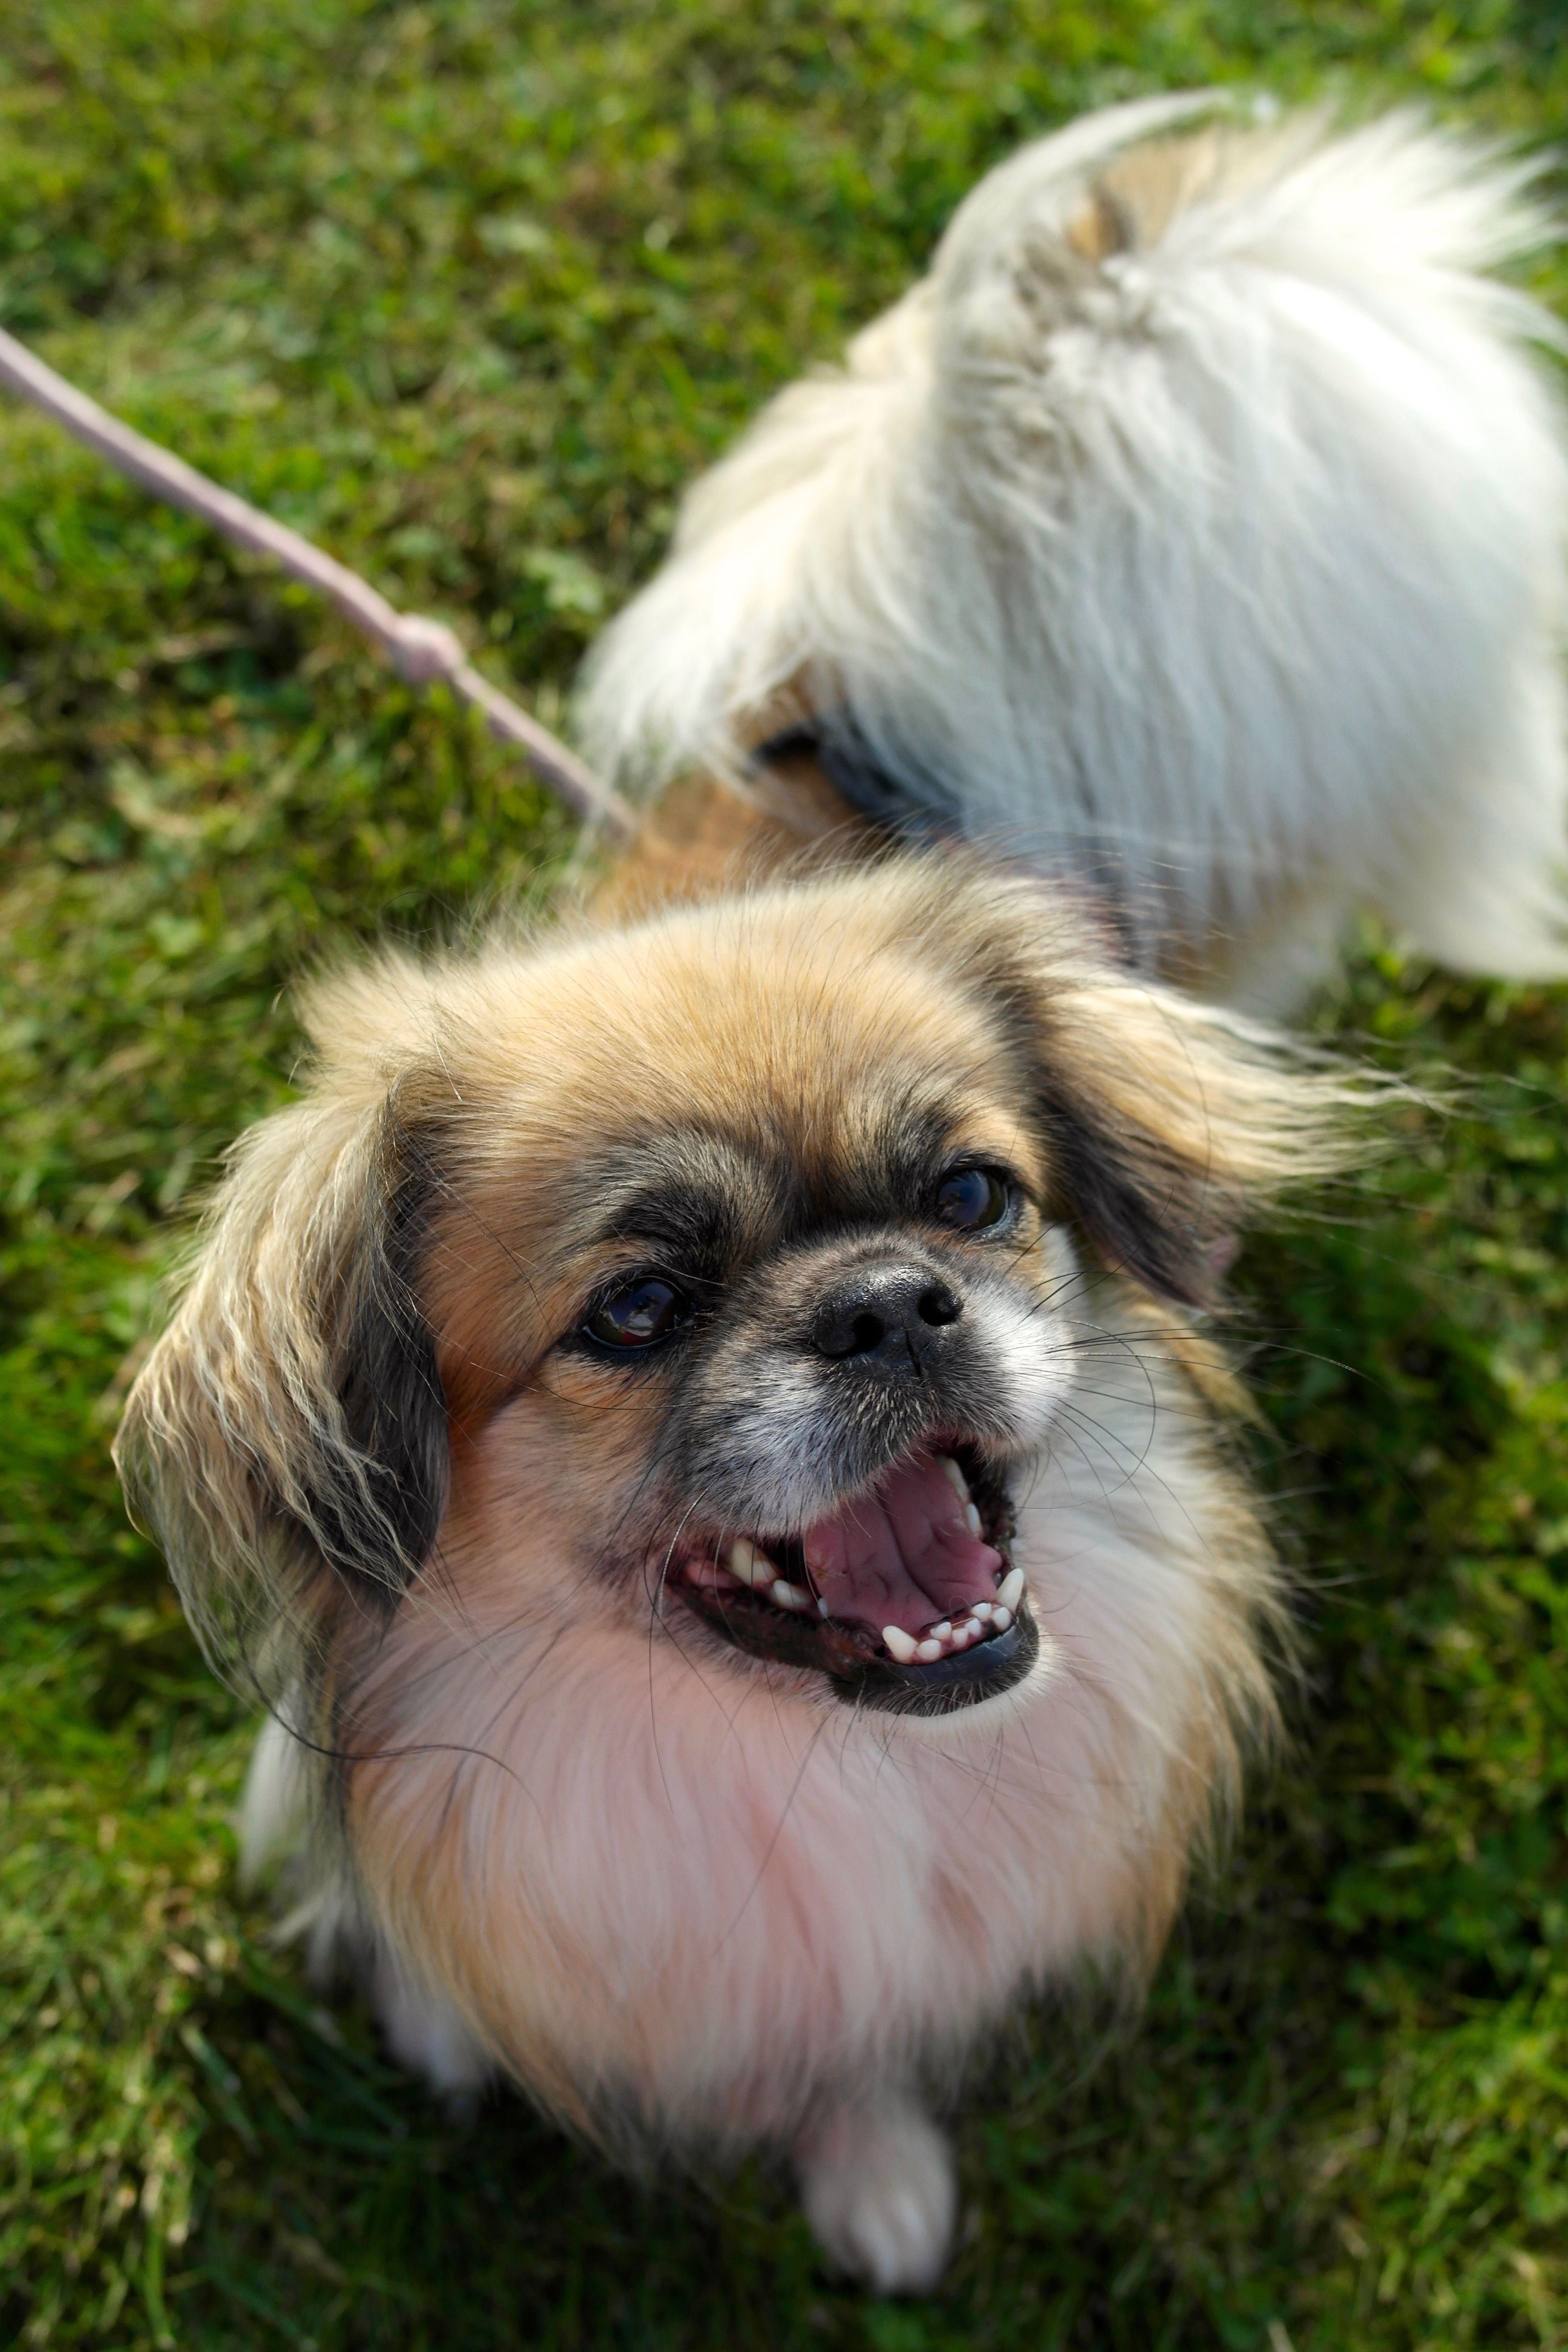 My Beautiful Senior Tibetan Spaniel Dog Named Lucky Who Is 8 Years Old Next Month Spaniel Dog Tibetan Spaniel Dogs